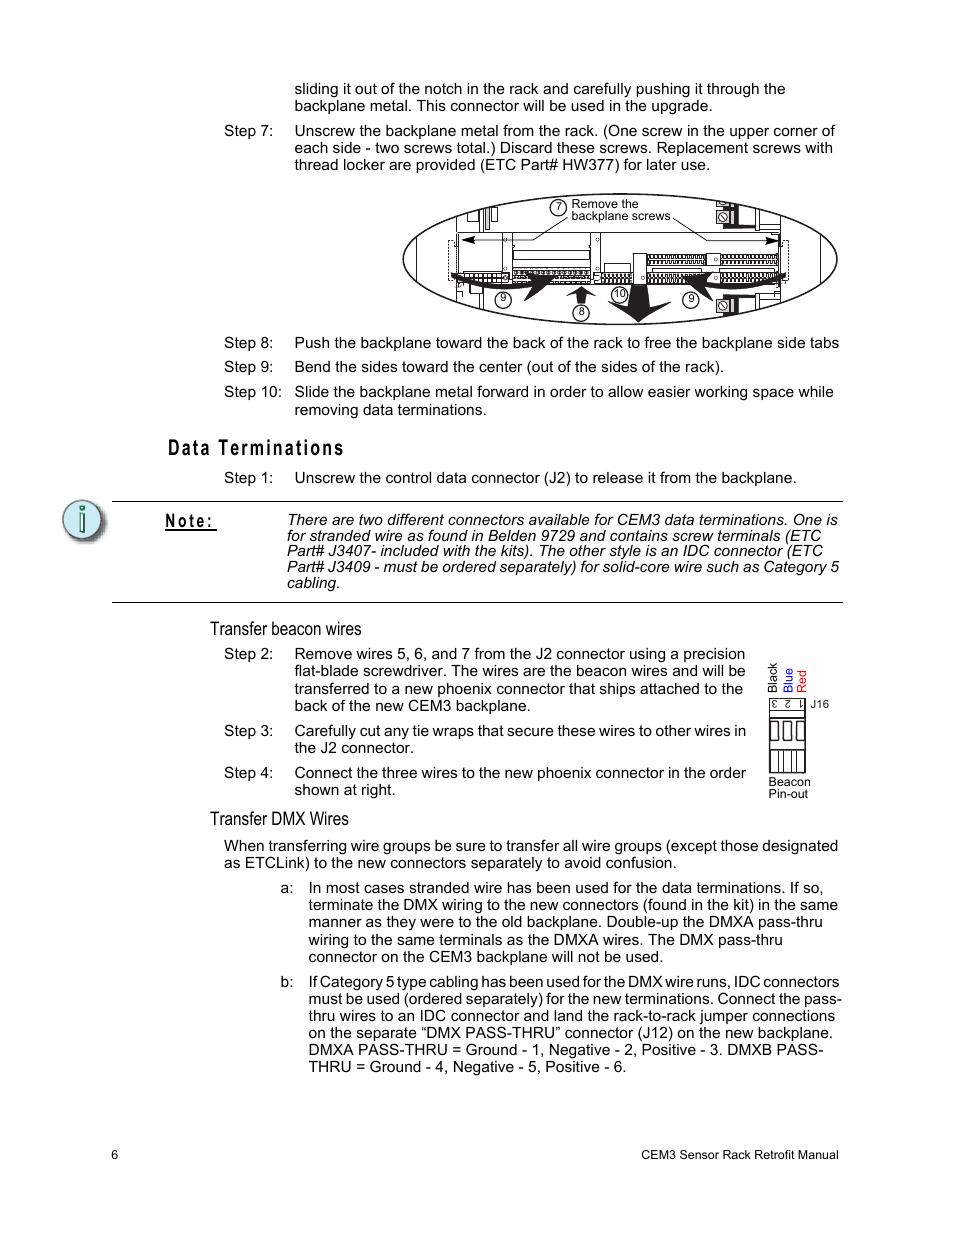 Data Terminations Transfer Beacon Wires Dmx Etc Center Rack Wiring Diagram N O T E Sensor